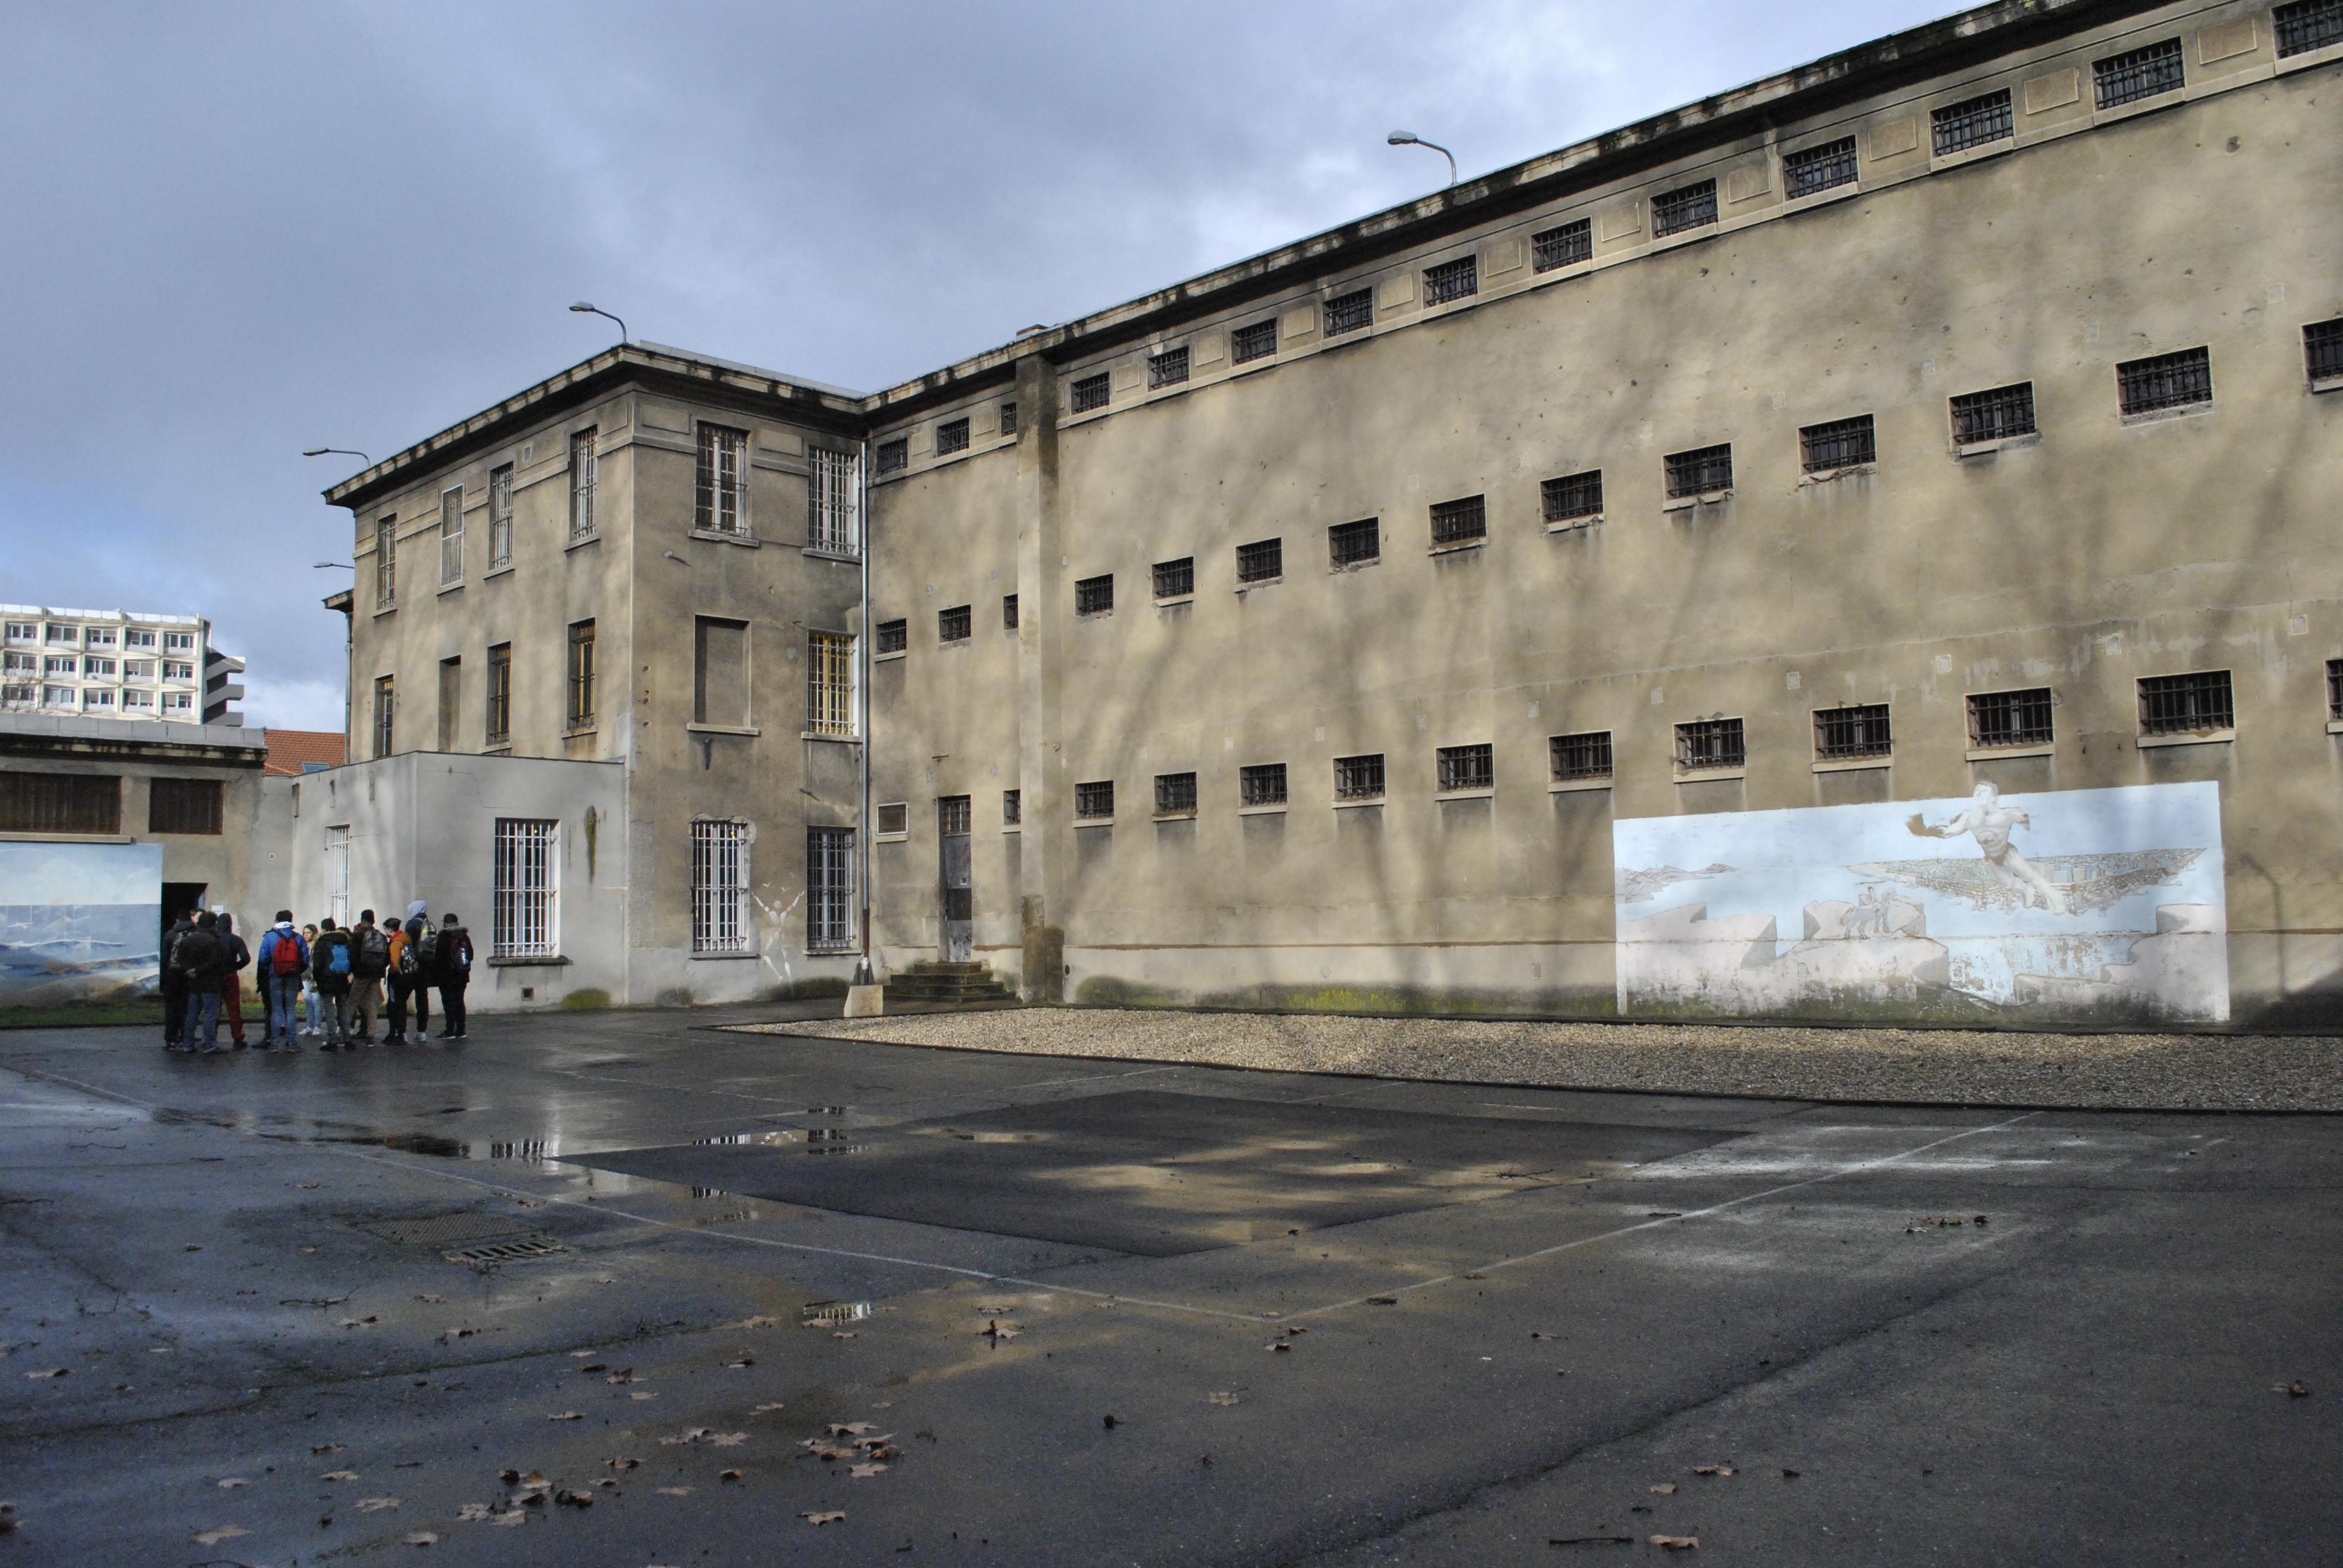 Visite de la prison Montluc